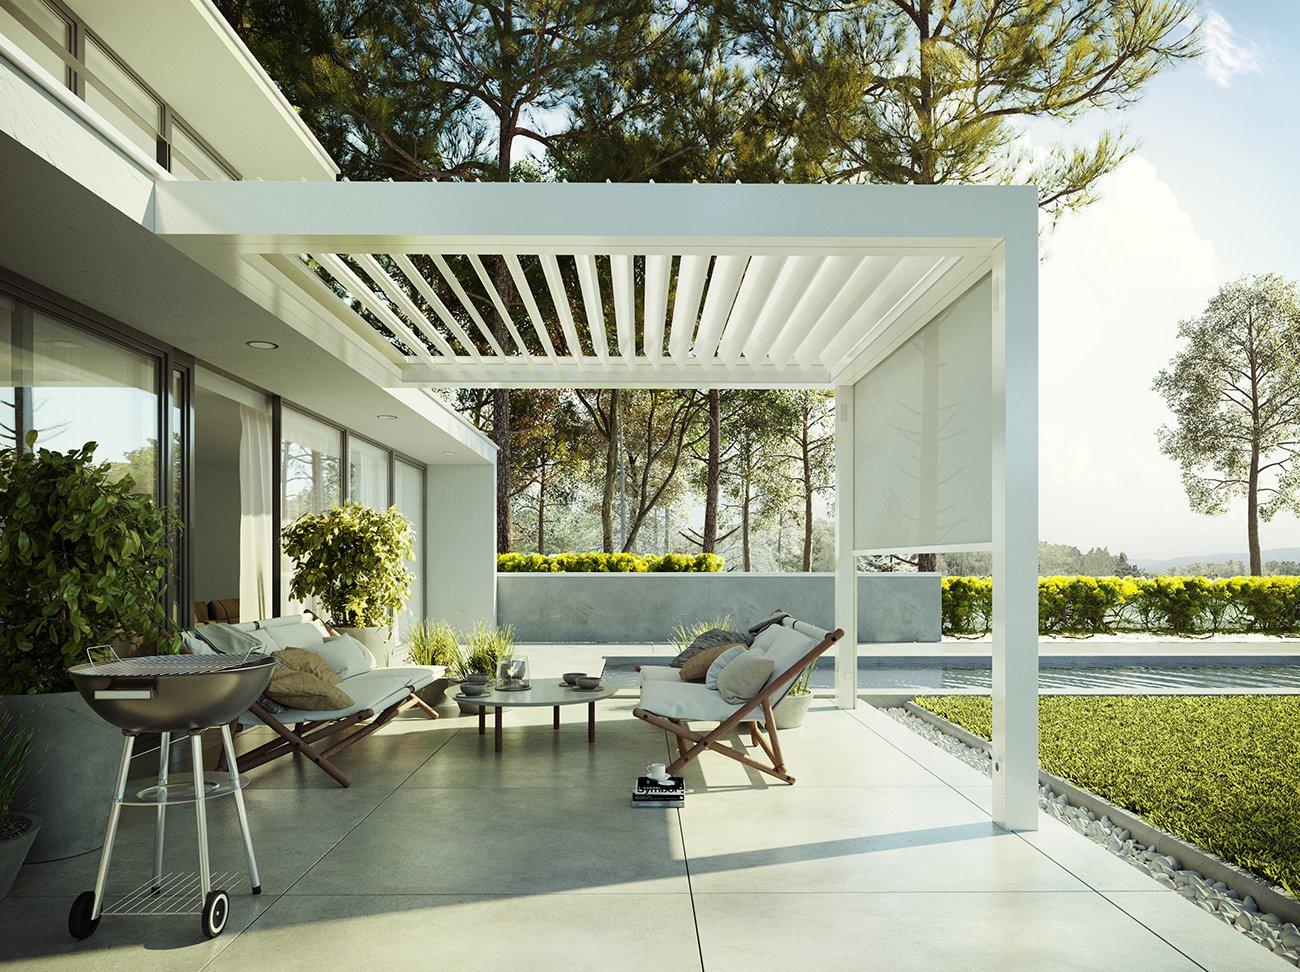 The Summer House Pergola designed by Jardin de Ville